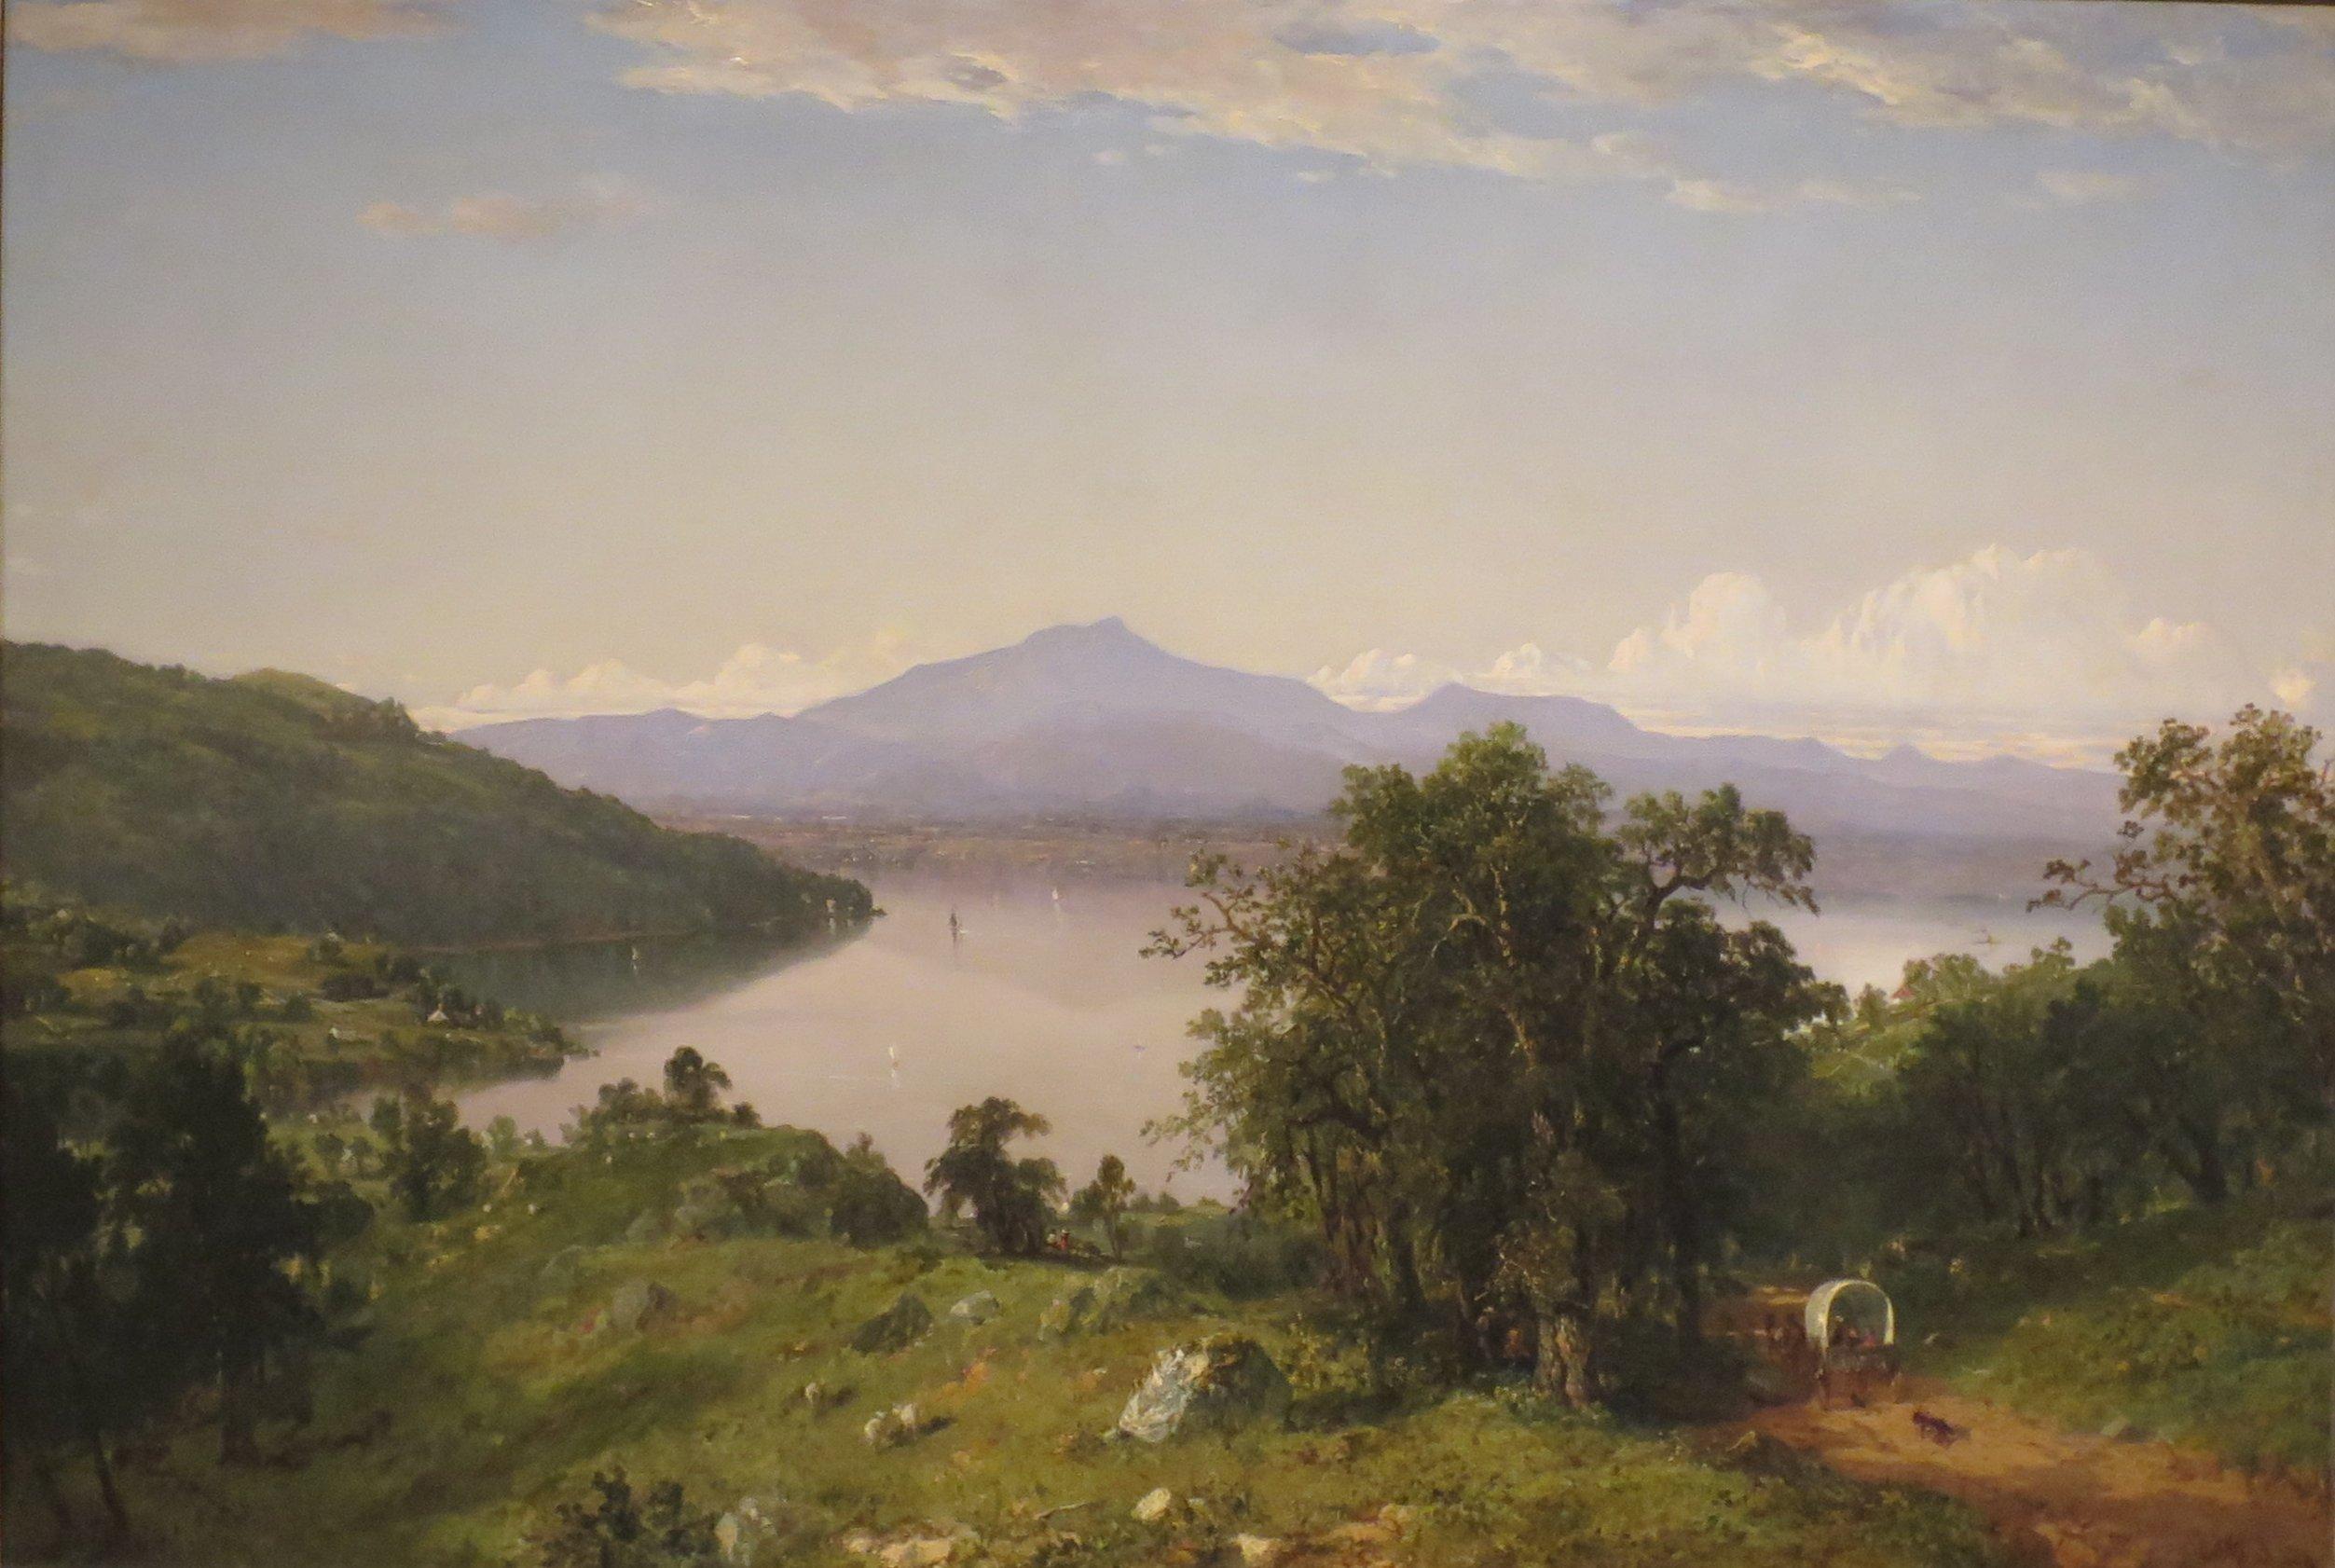 kensett online dating Passing off of the storm artist: john frederick kensett (american, cheshire,  connecticut 1816–1872 new york) date: 1872 culture: american medium: oil  on.